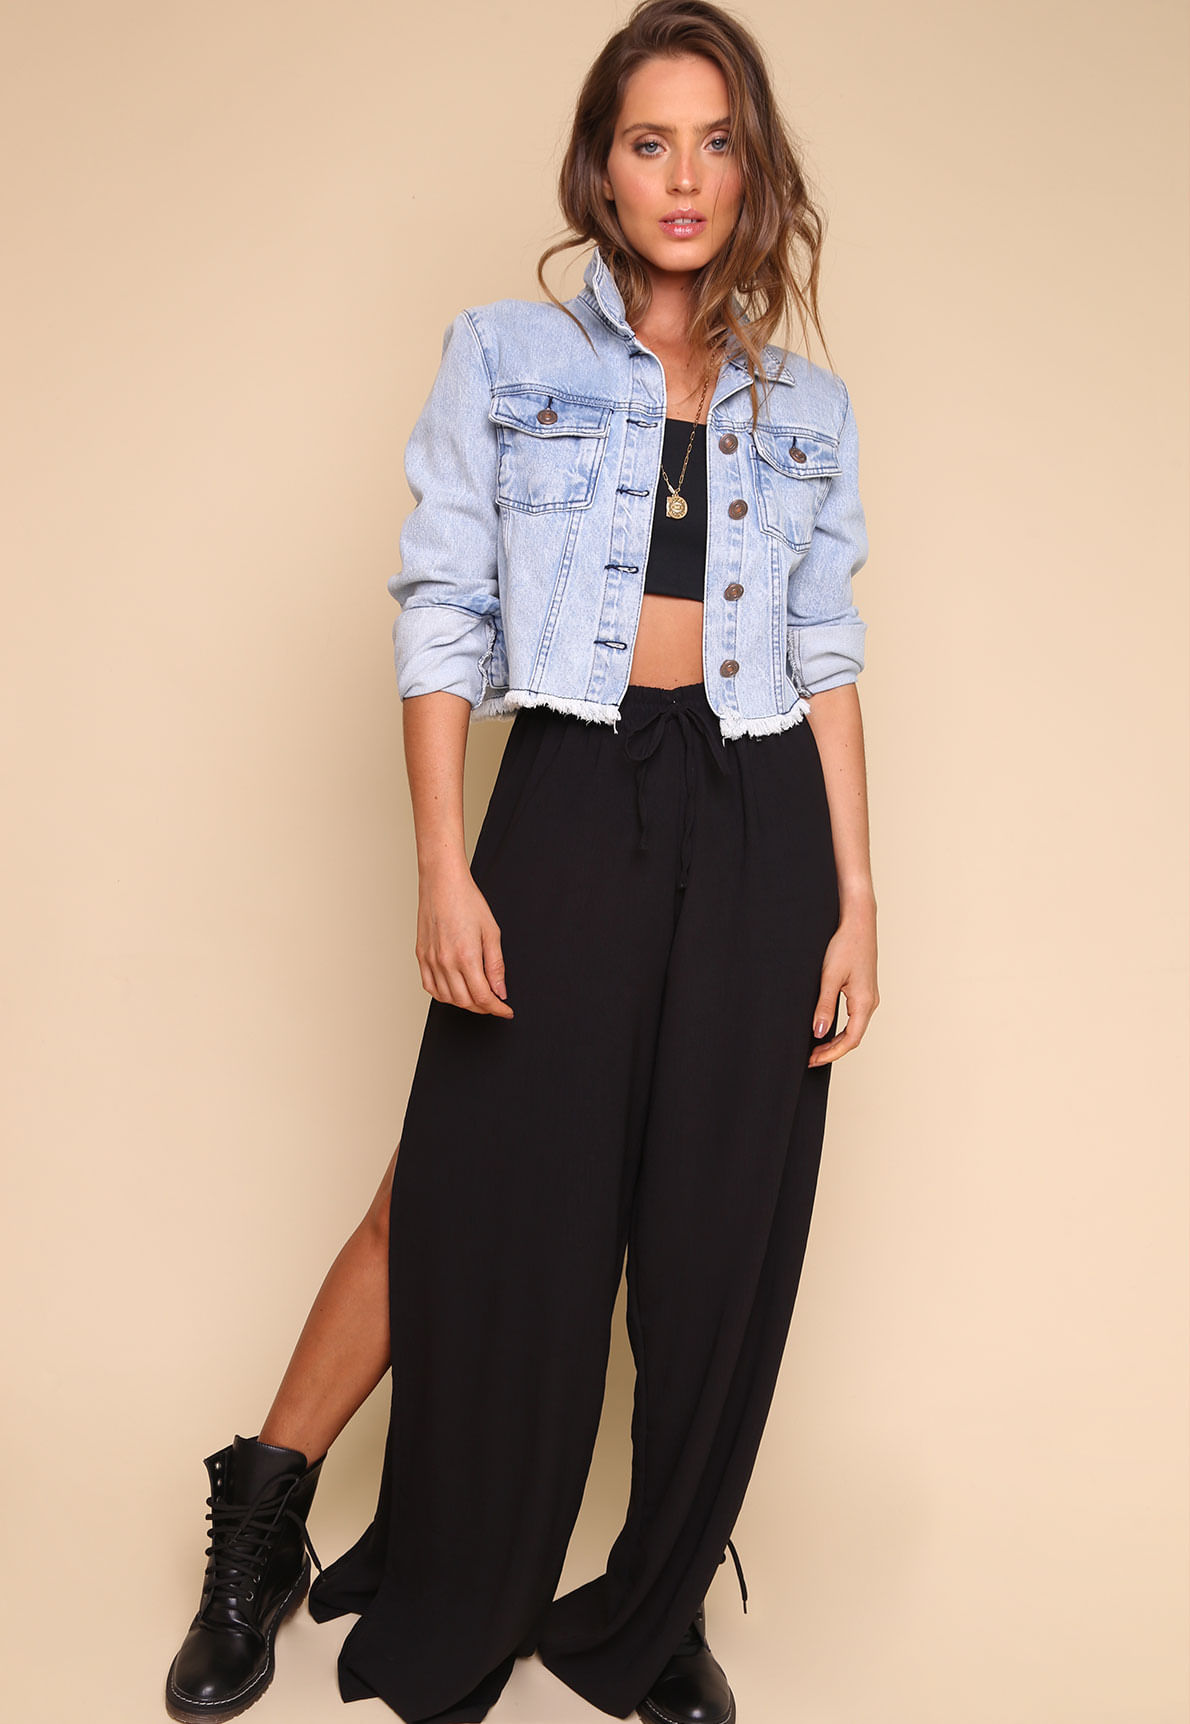 24080-jaqueta-jeans-cropped-florence-mundo-lolita-05